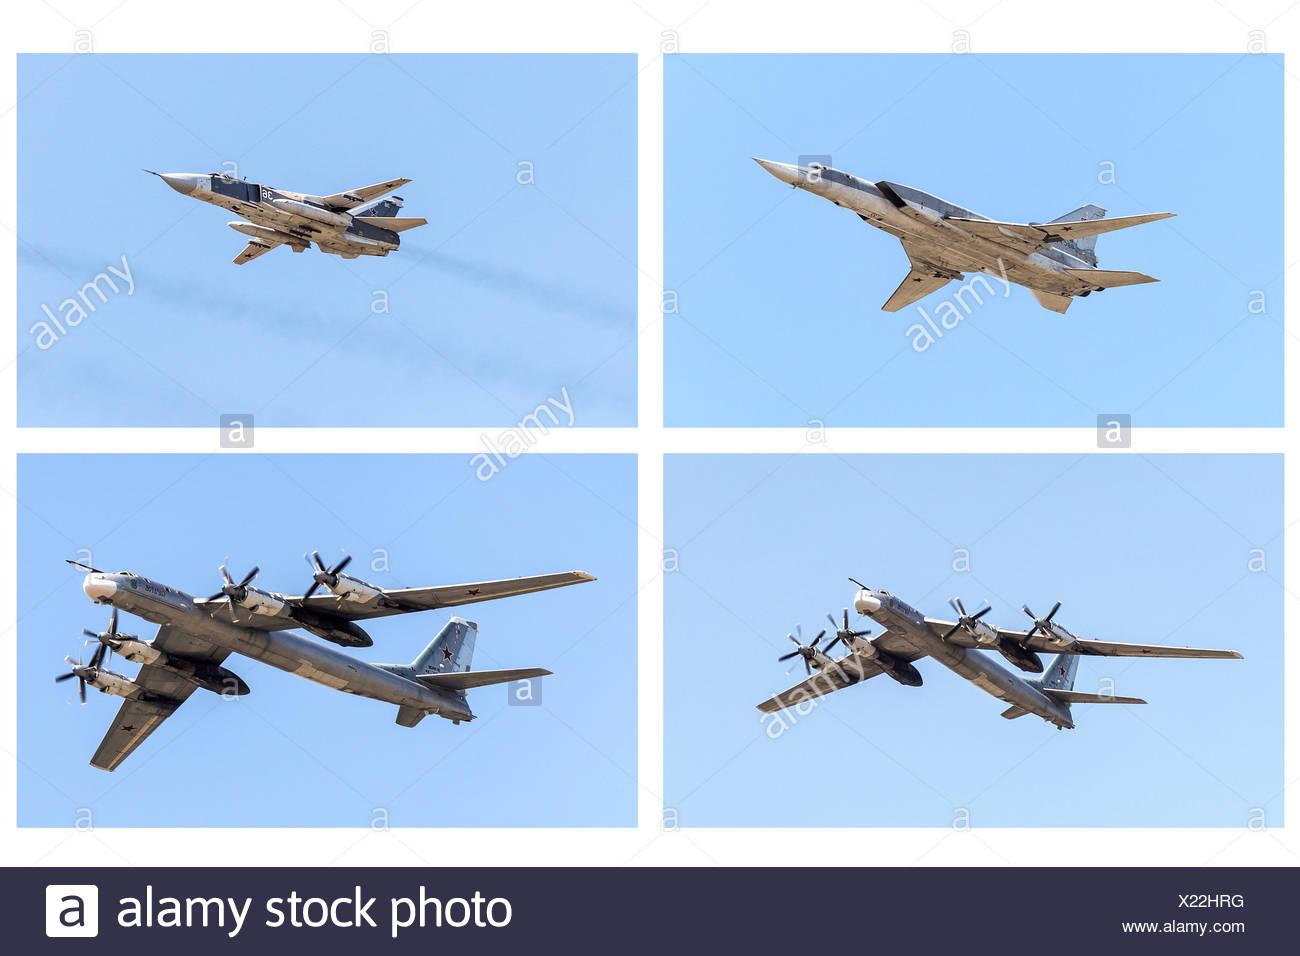 Diversi tipi di aerei militari foto immagine stock 276653092 alamy - Diversi tipi di figa ...